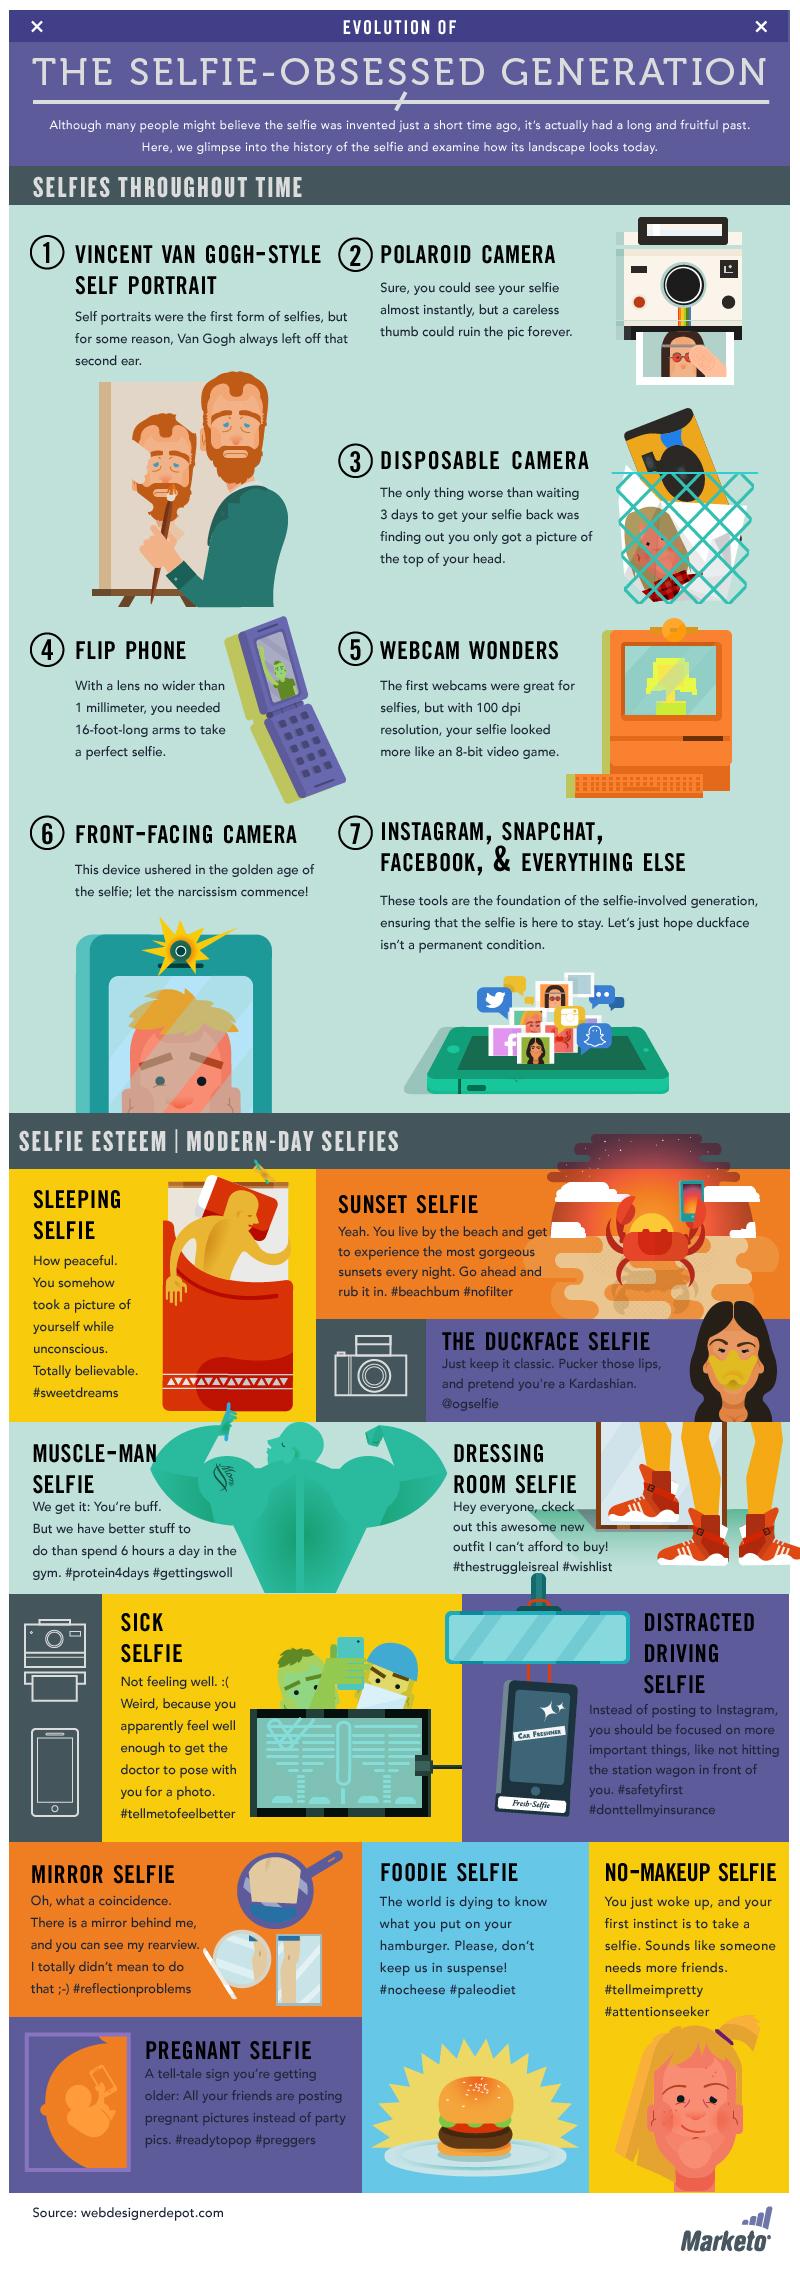 La historia de la obsesión Selfie